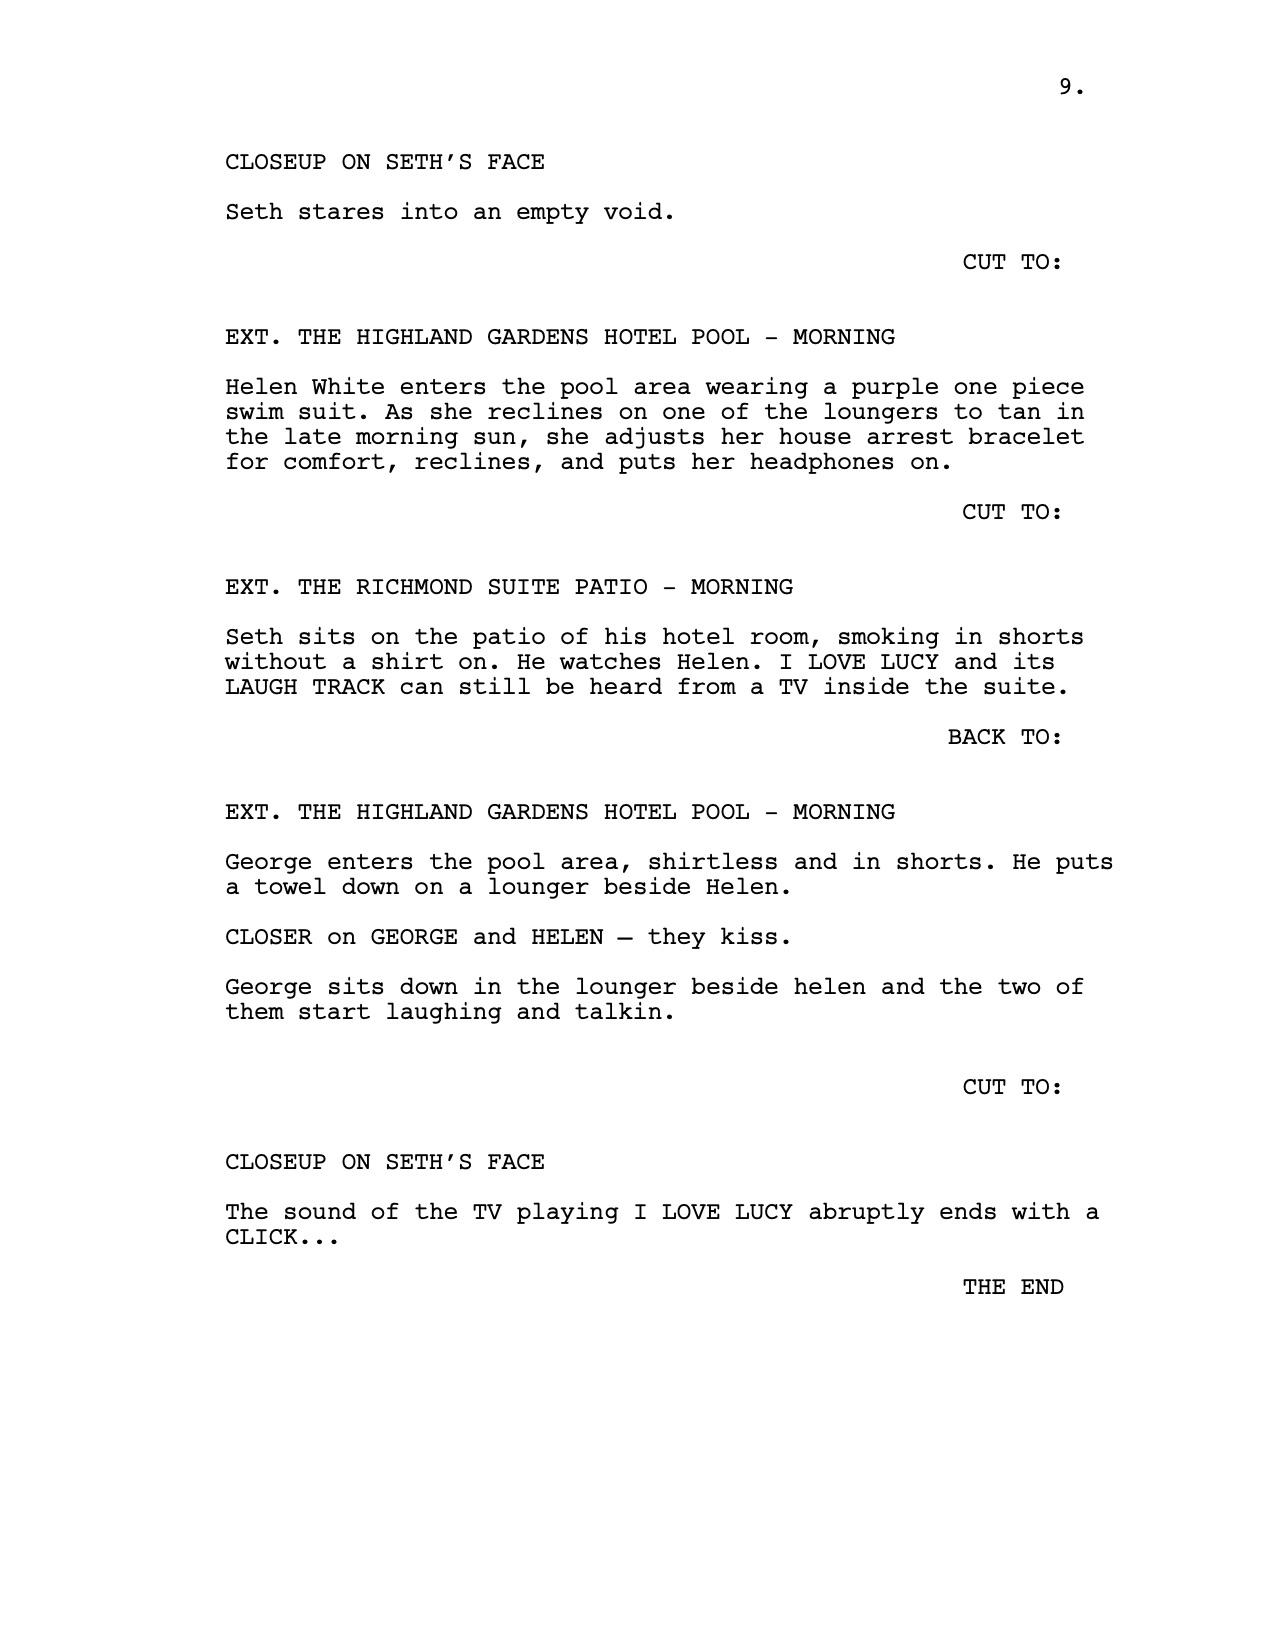 Page-9-DavidLook-TheGardens-1